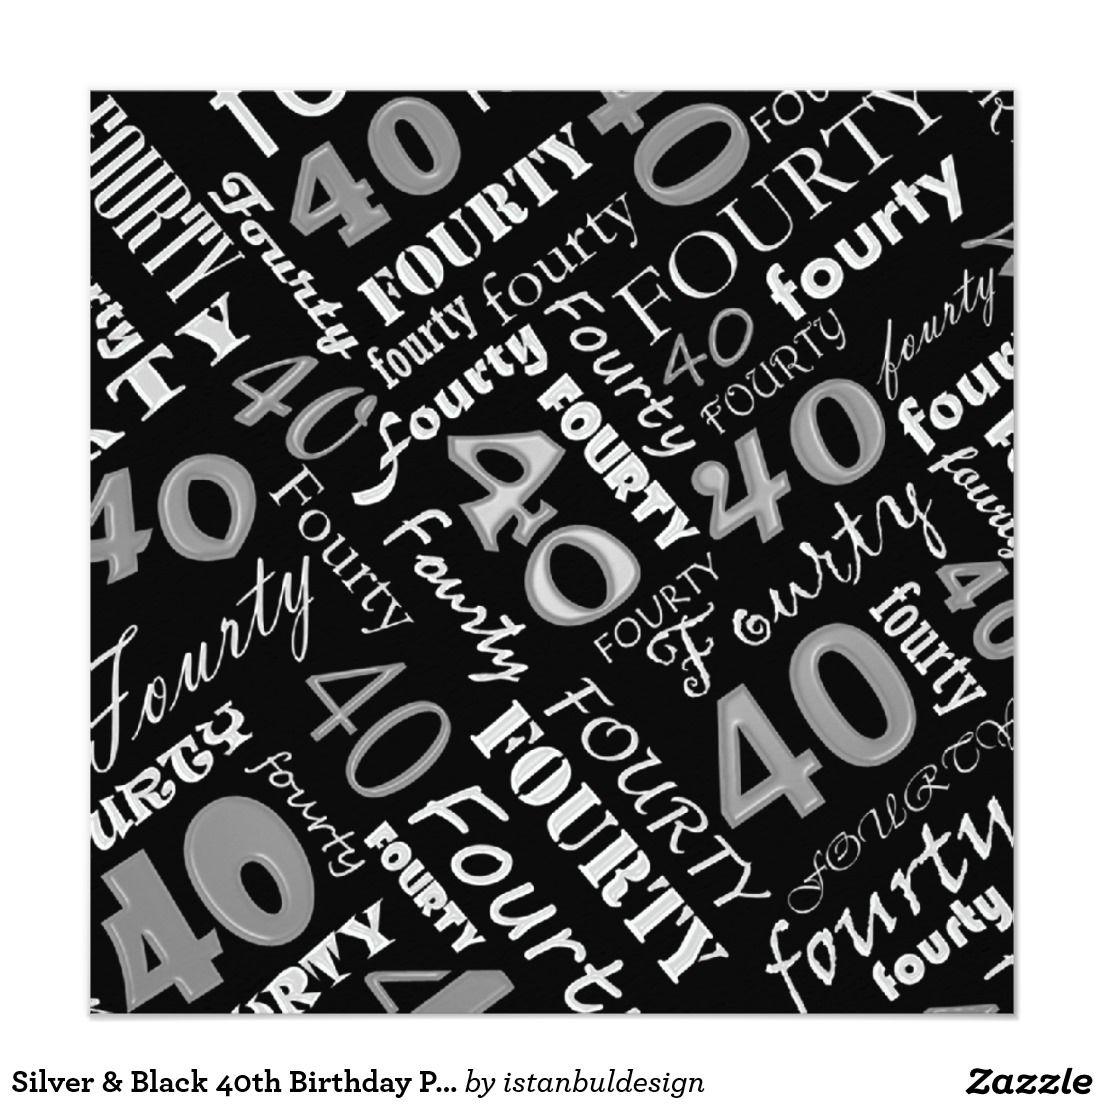 Silver black 40th birthday party invitation birthday party silver black 40th birthday party invitation filmwisefo Choice Image